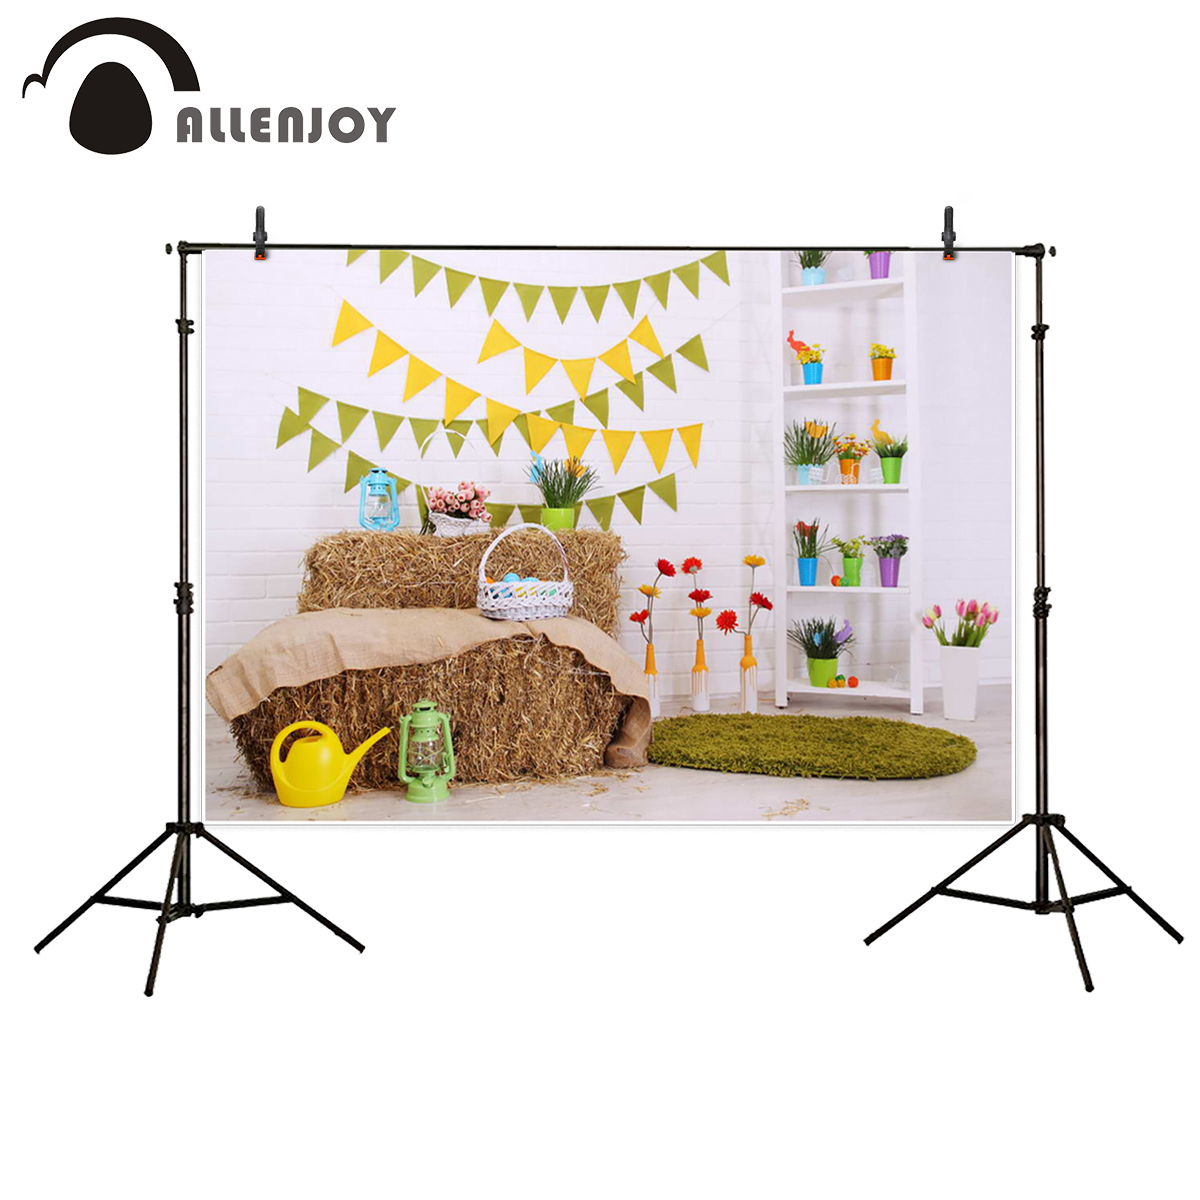 Allenjoy background for photo studio Easter basket lamp flower cute backdrop photography background fantasy backdrops  недорого